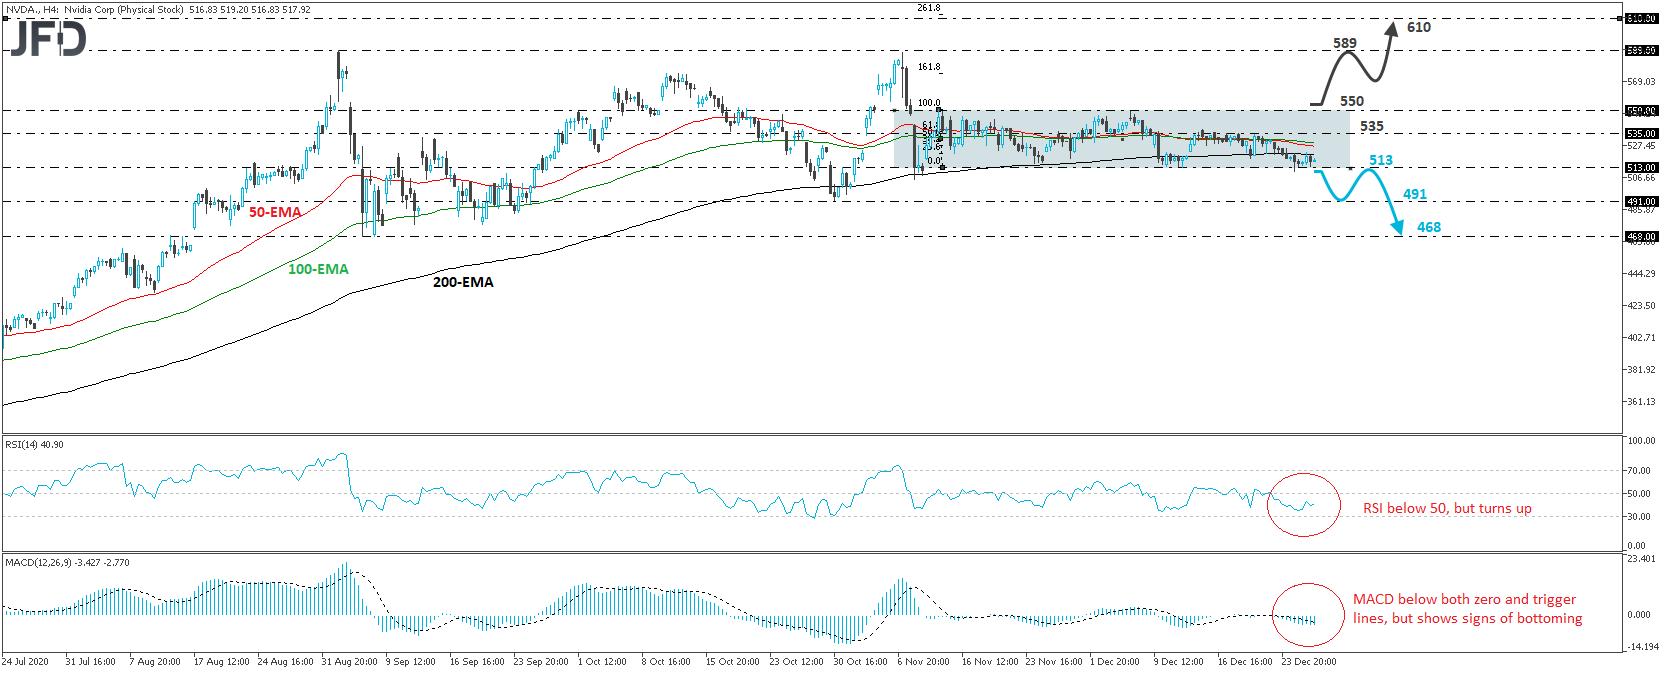 Nvidia stock 4-hour chart technical analysis